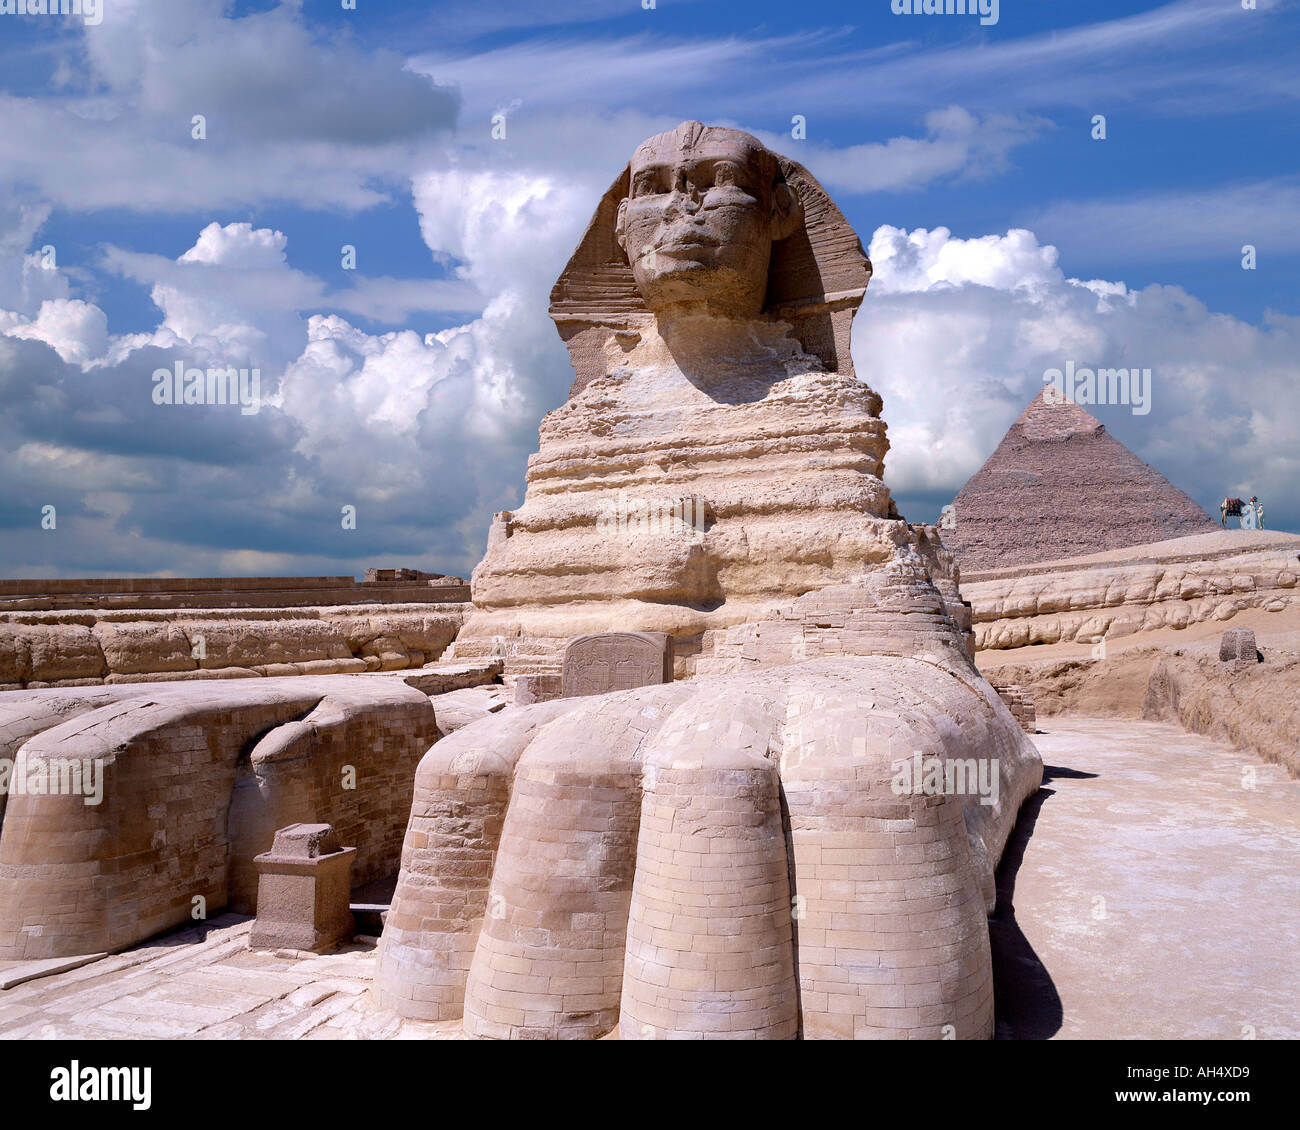 EG - CAIRO: The Sphinx and Pyramid at El Giza - Stock Image